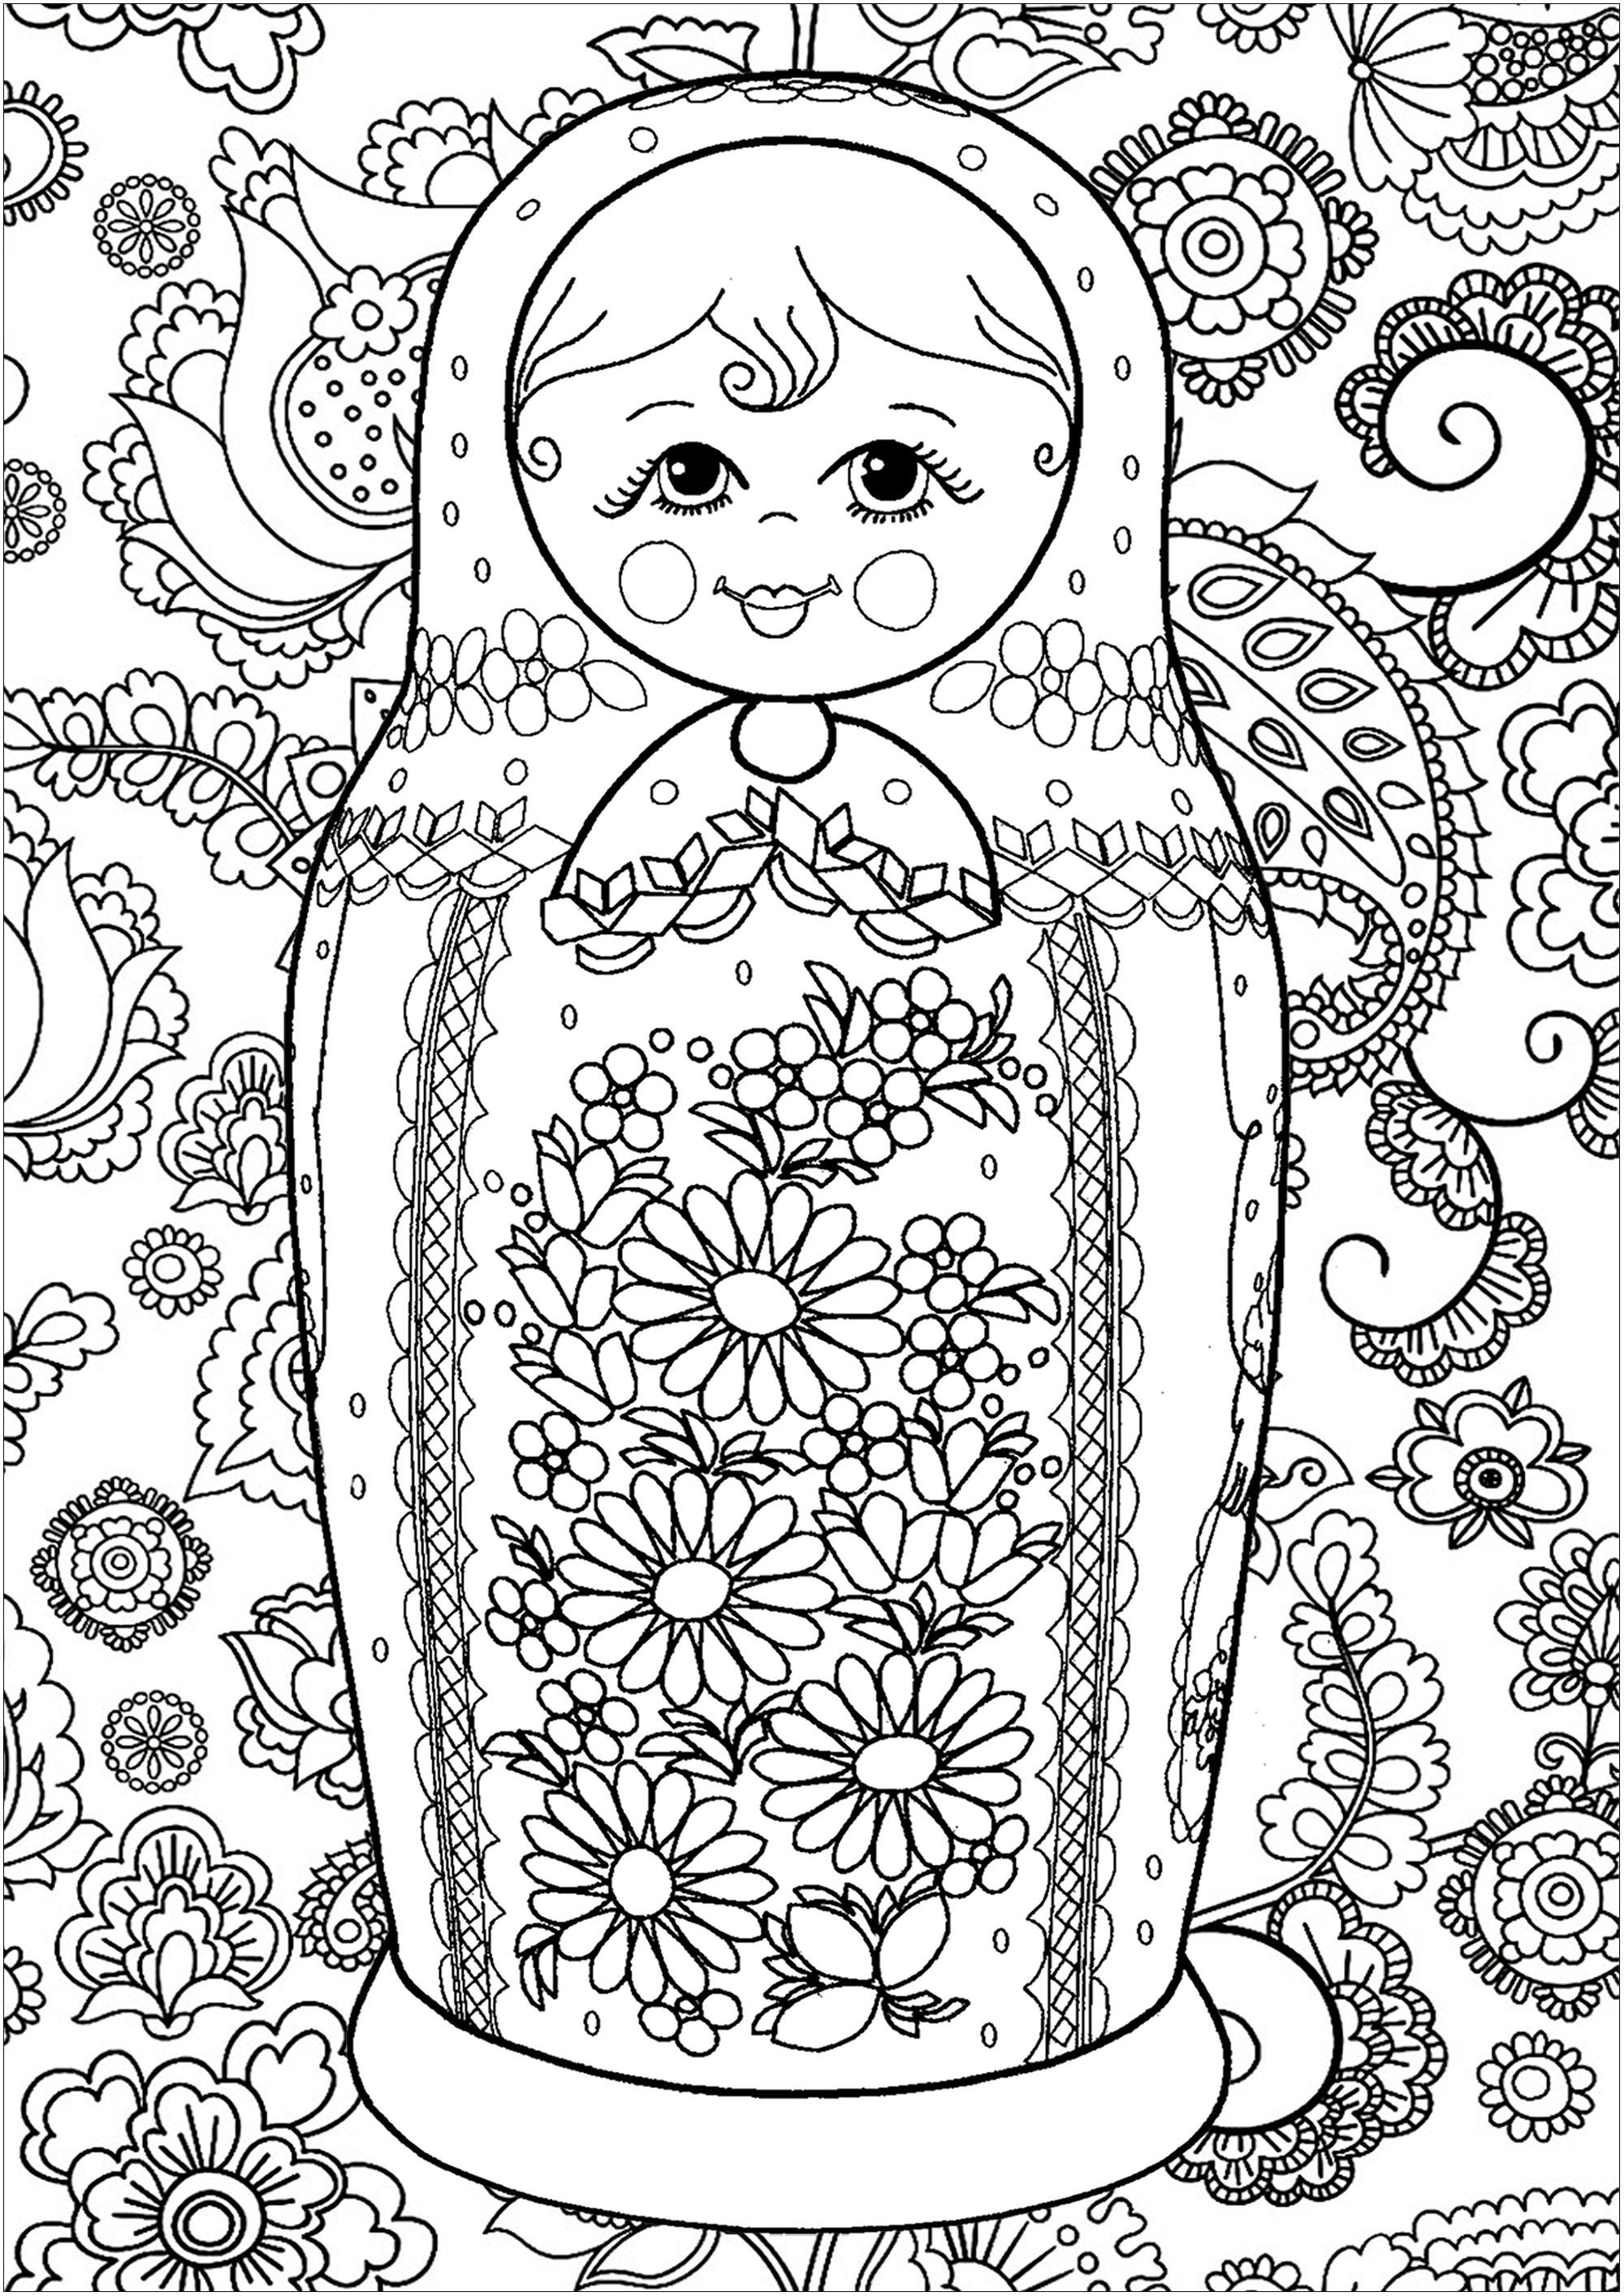 Colorear para Adultos : Muñecas Rusas - 3